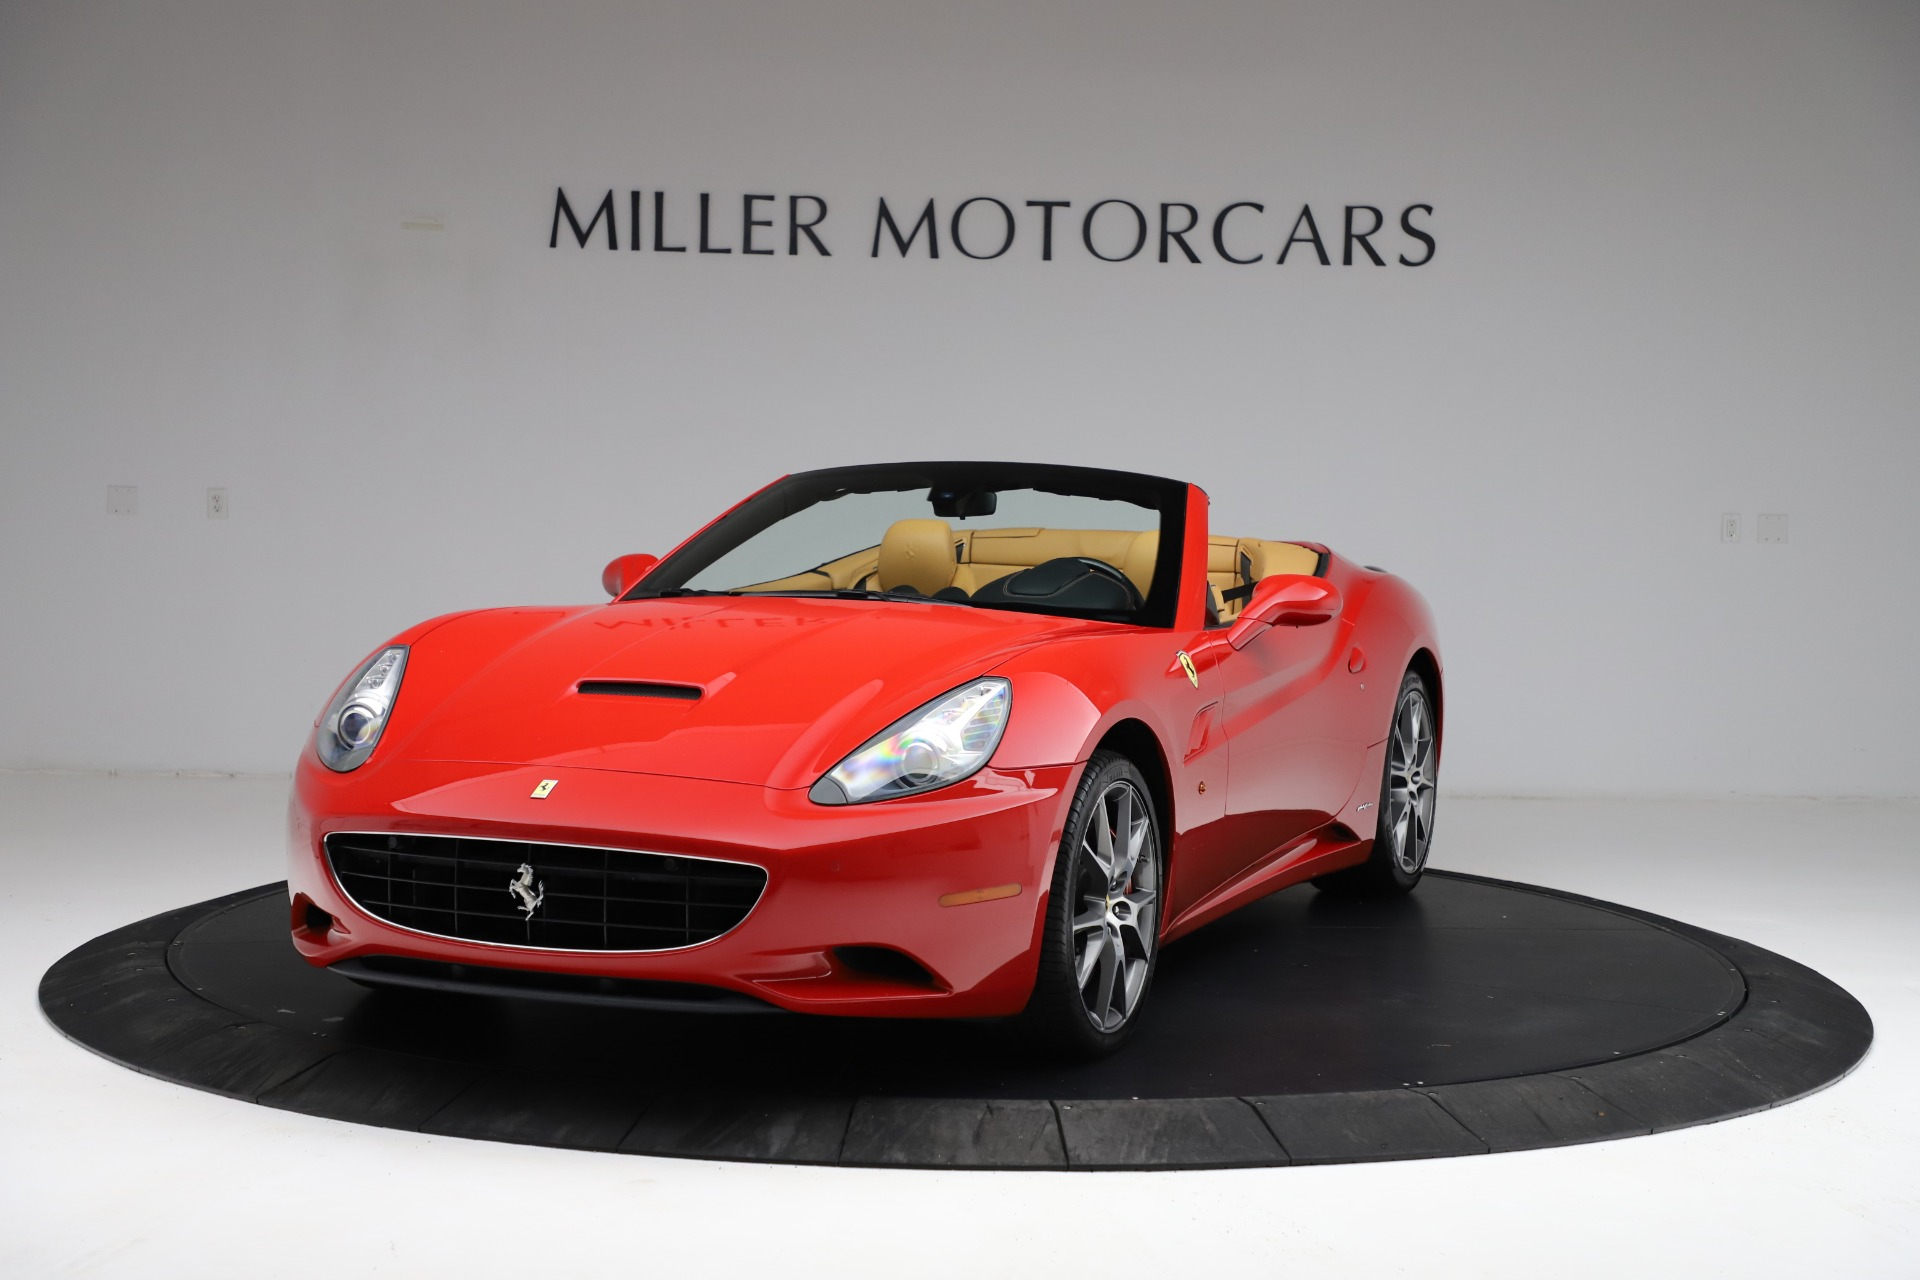 Used 2010 Ferrari California for sale $114,900 at Maserati of Greenwich in Greenwich CT 06830 1